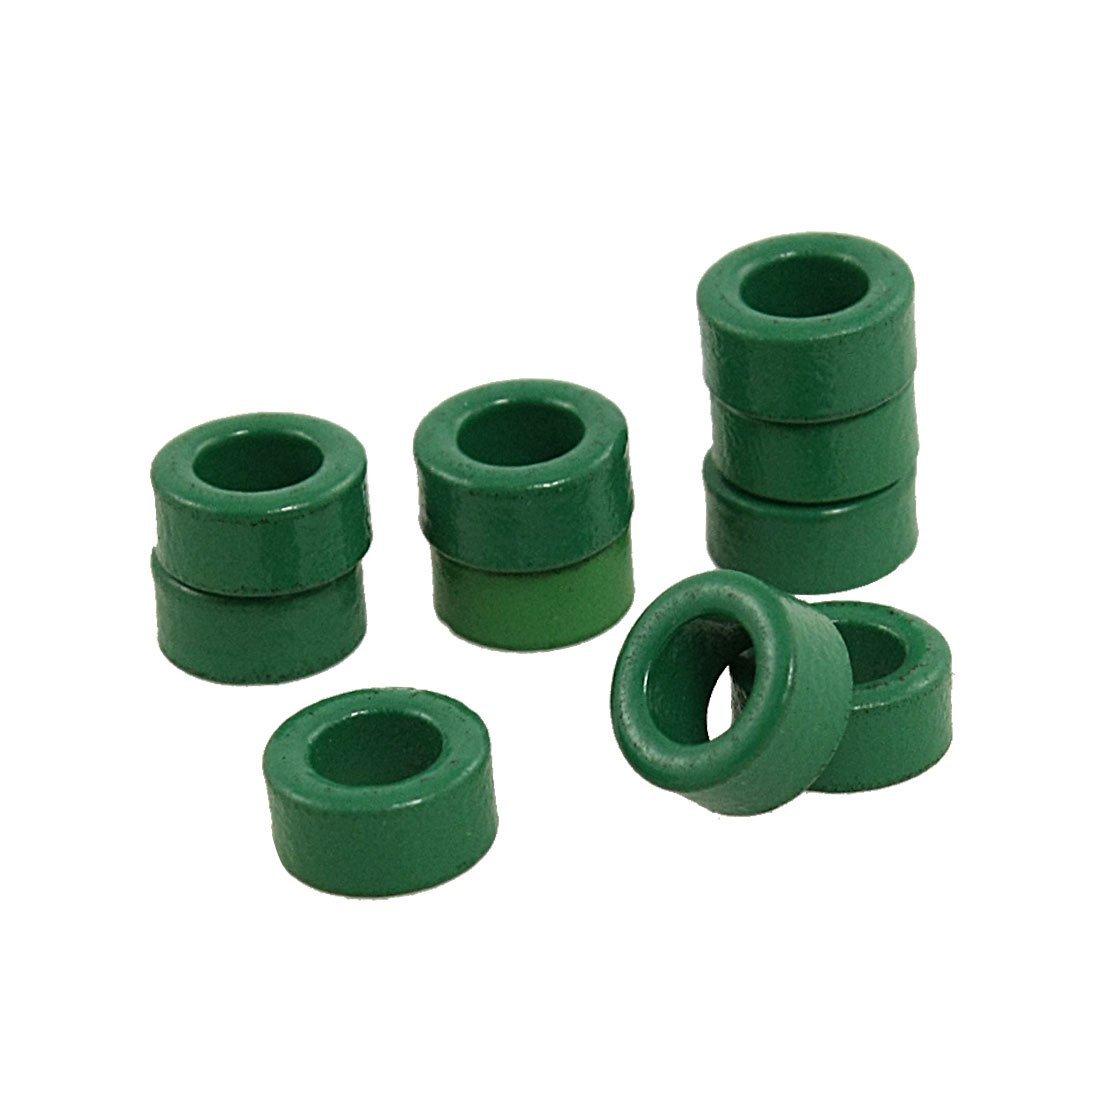 FJS Wholesale 10 Pcs Inductor Coils Green Toroid Ferrite Cores 10mm x 6mm x 5mm<br><br>Aliexpress